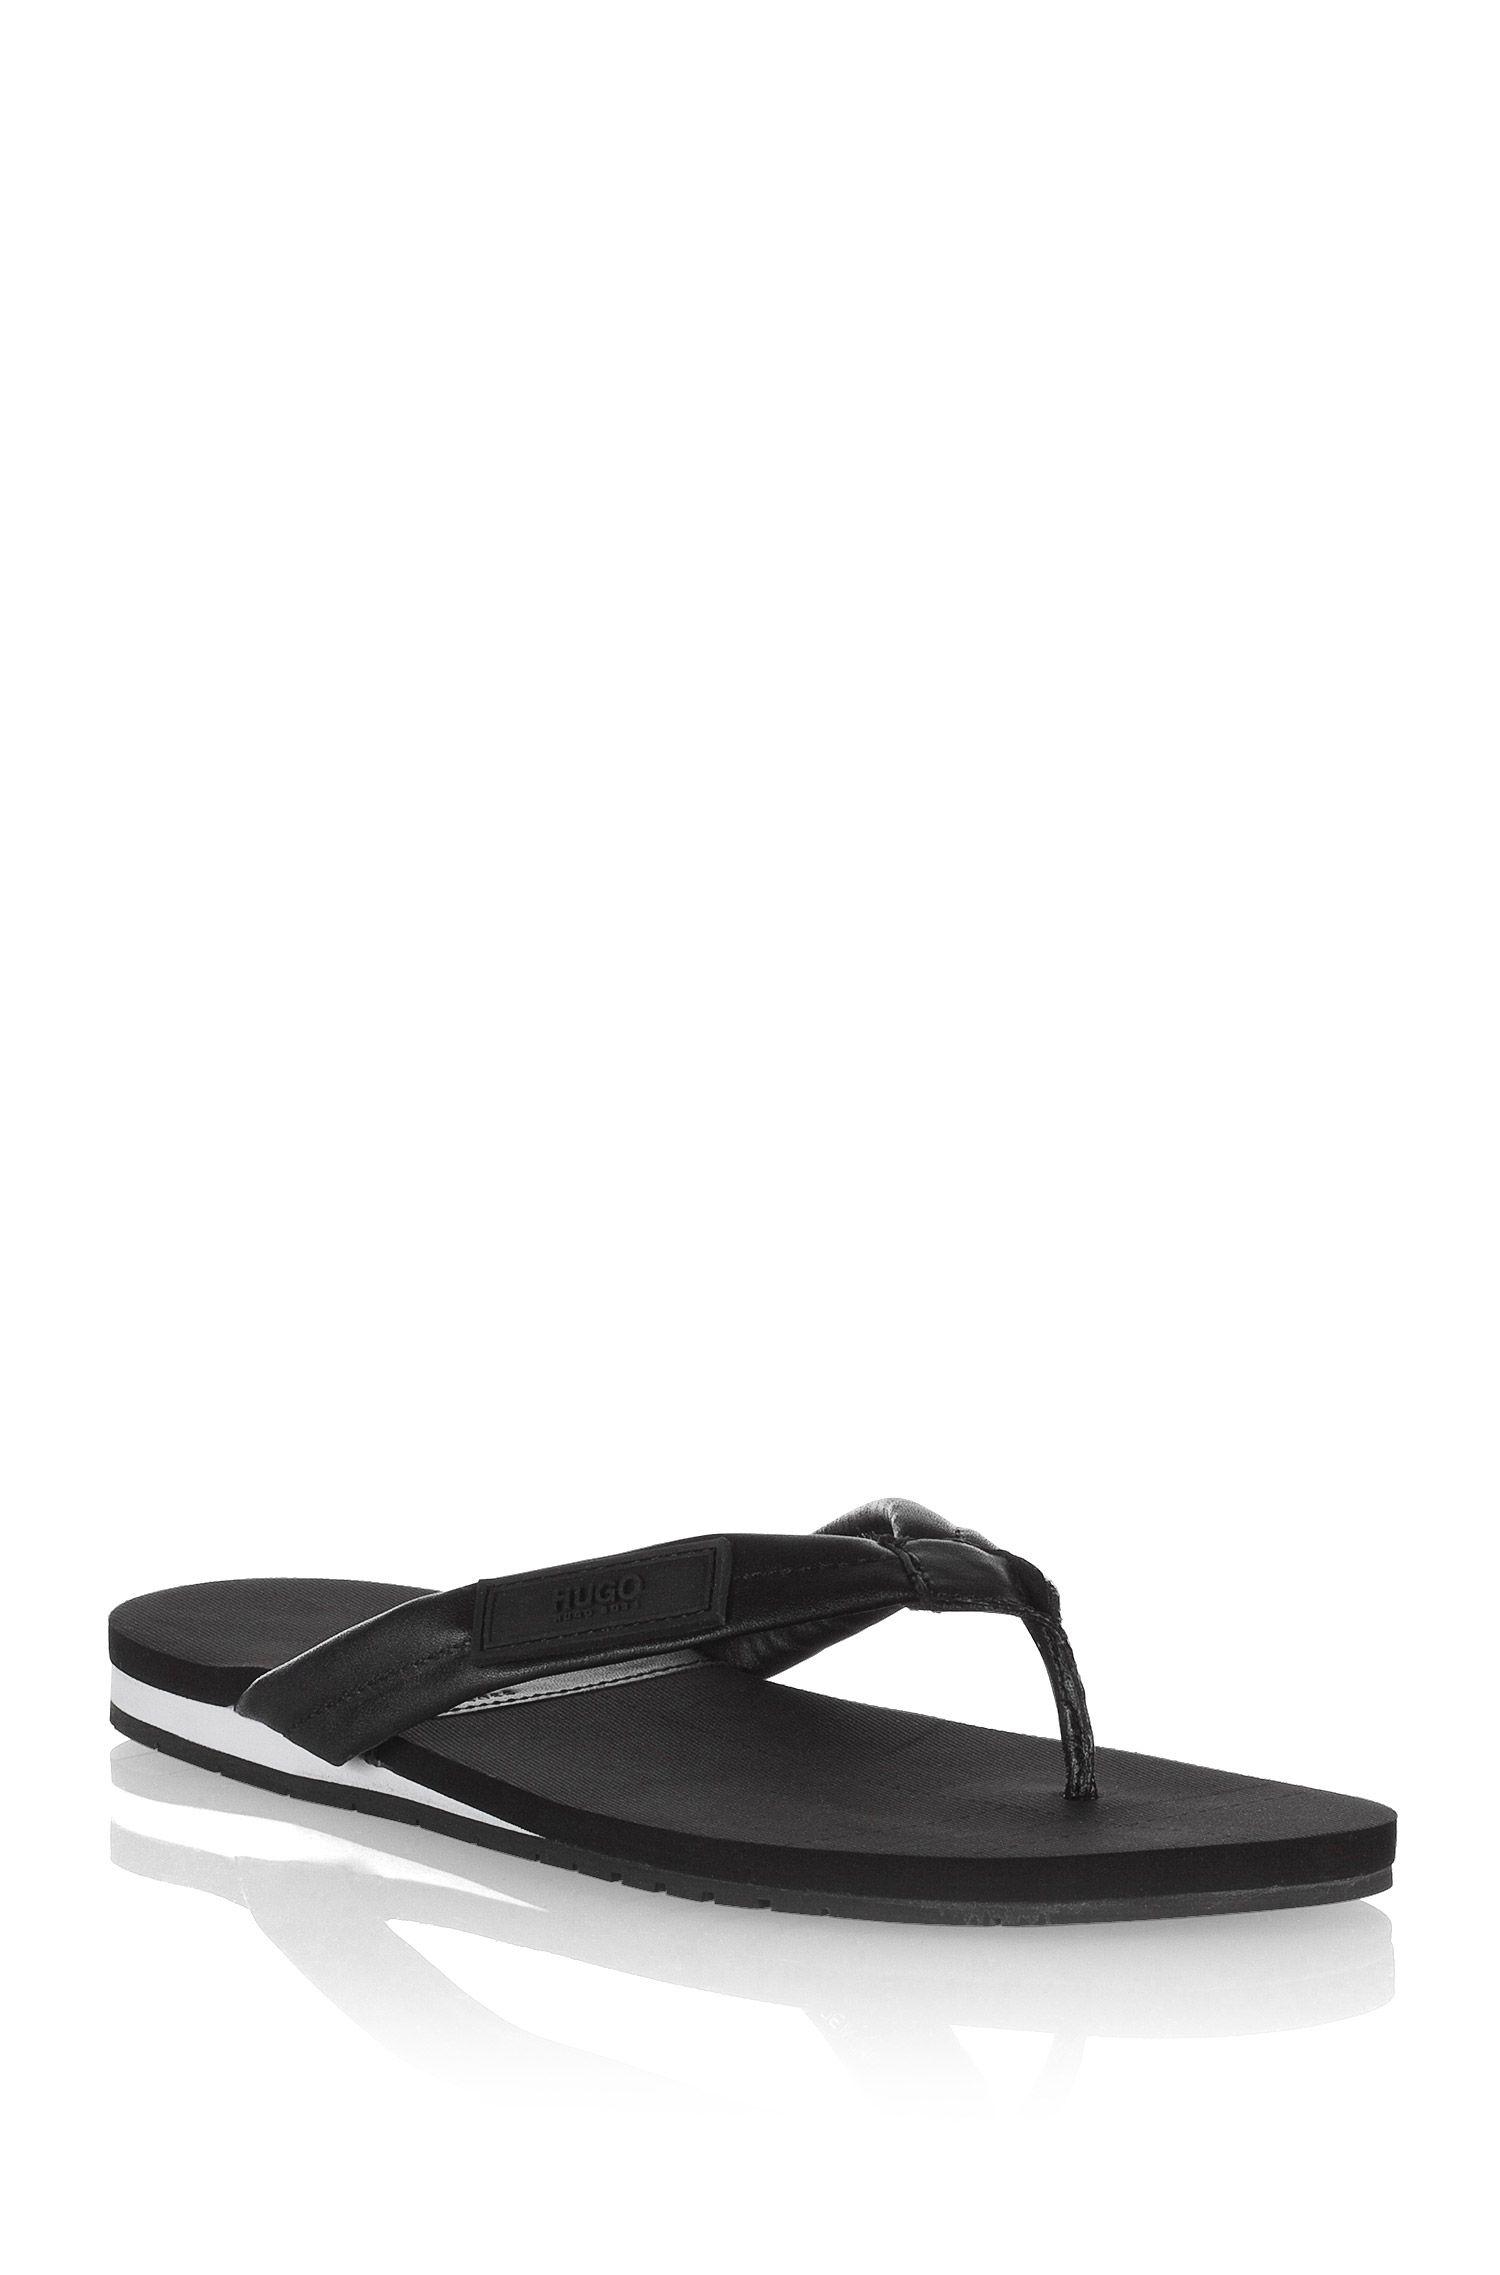 Zehen-Sandale ´THACO` mit Gummi-Sohle